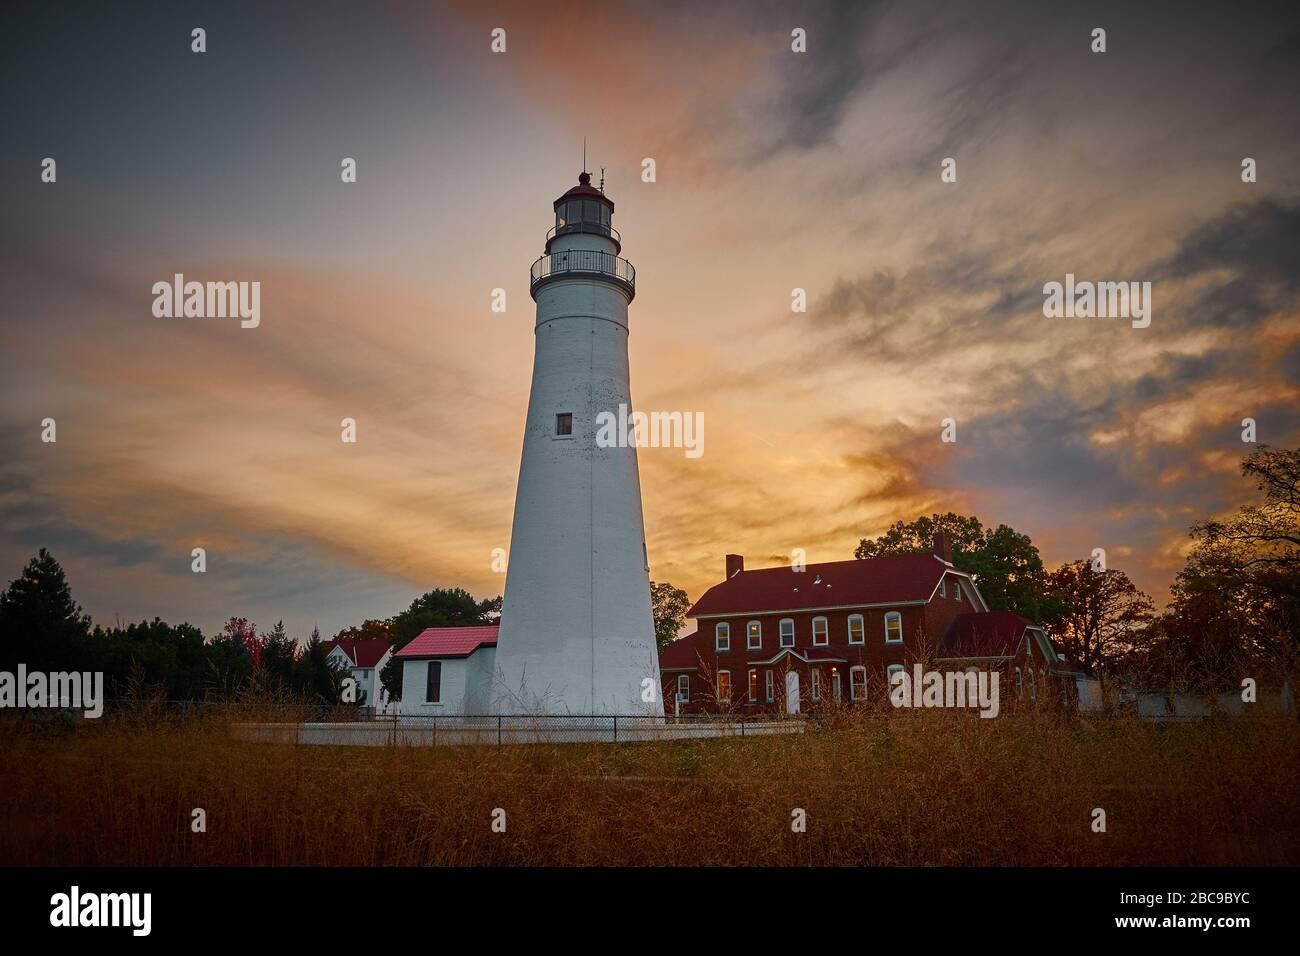 Sunset Photo of Fort Gratiot light house in Port Huron Michigan Stock Photo